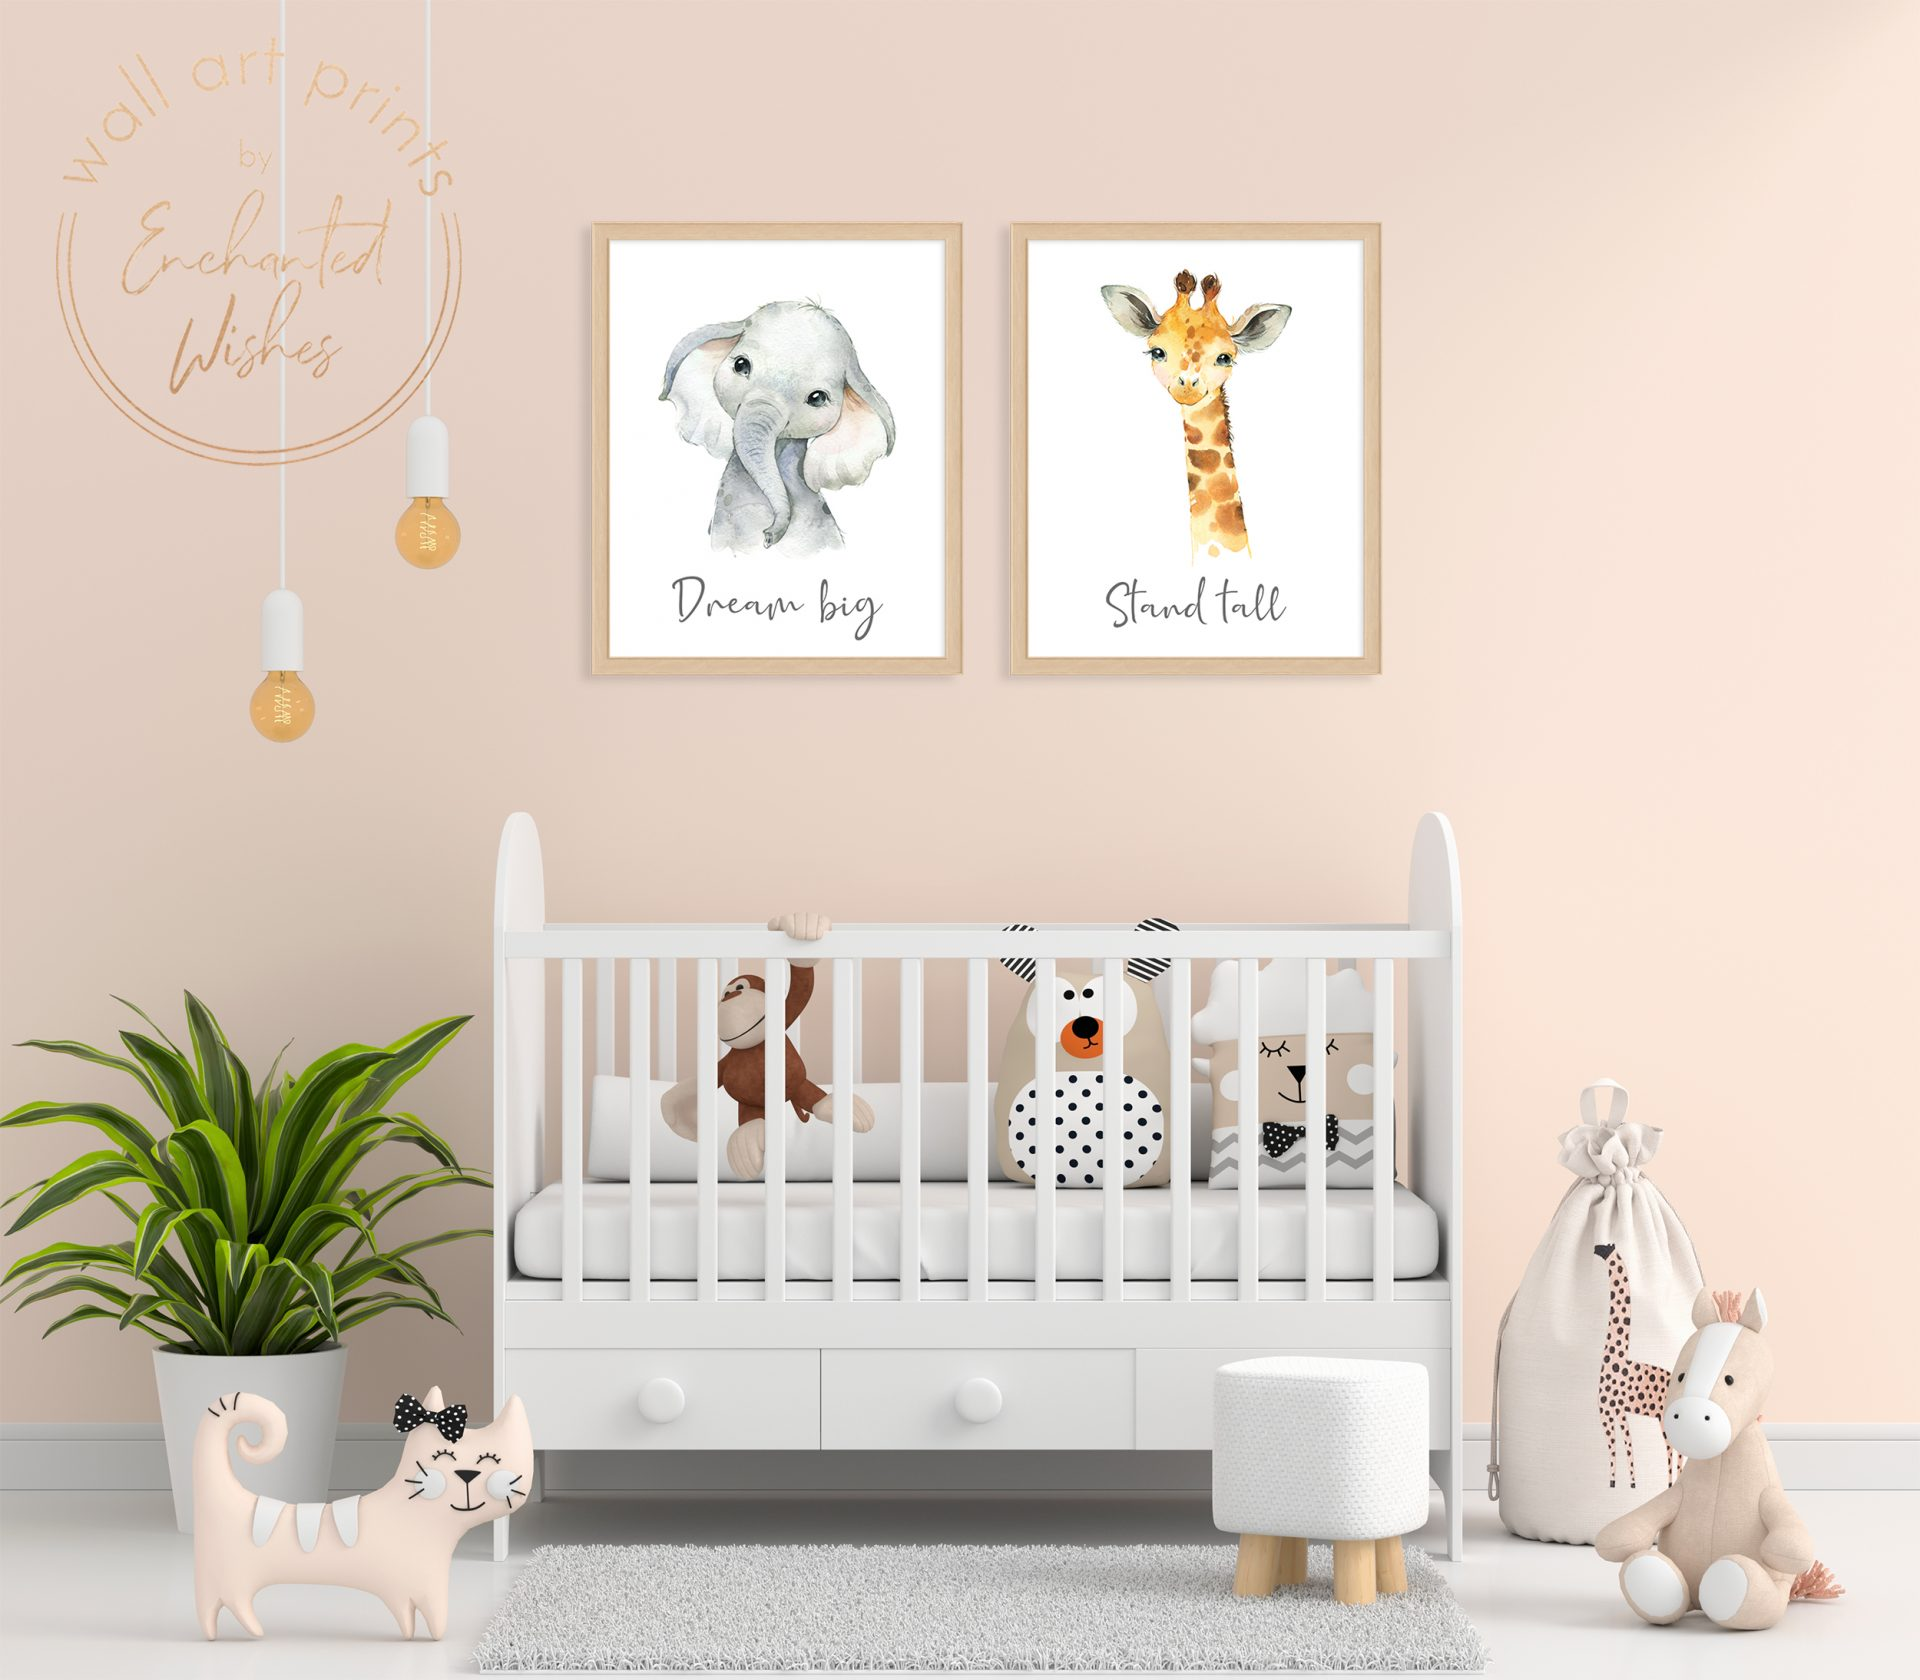 Baby safari animal quote prints